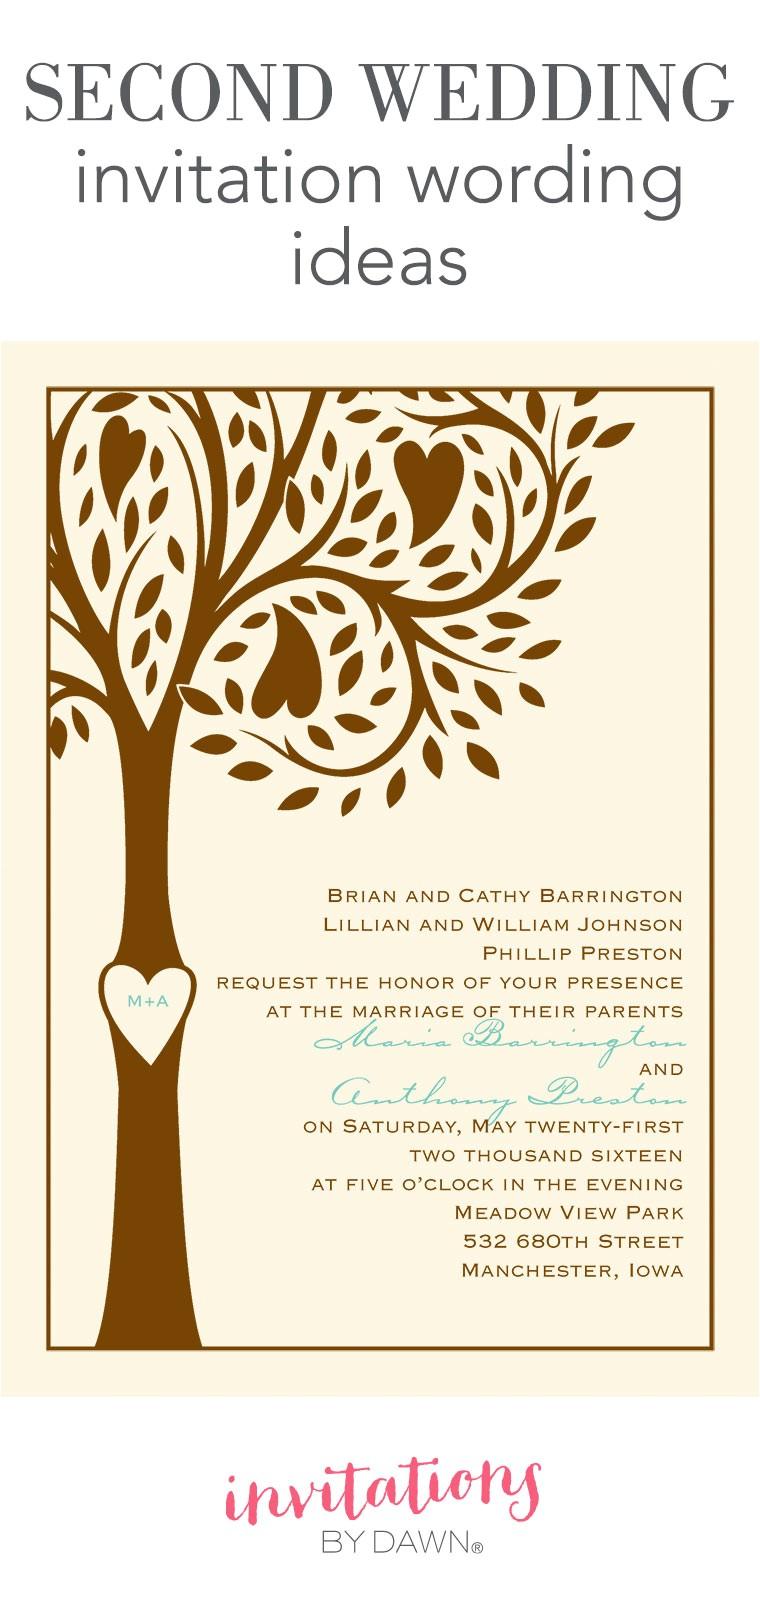 second wedding invitation wording